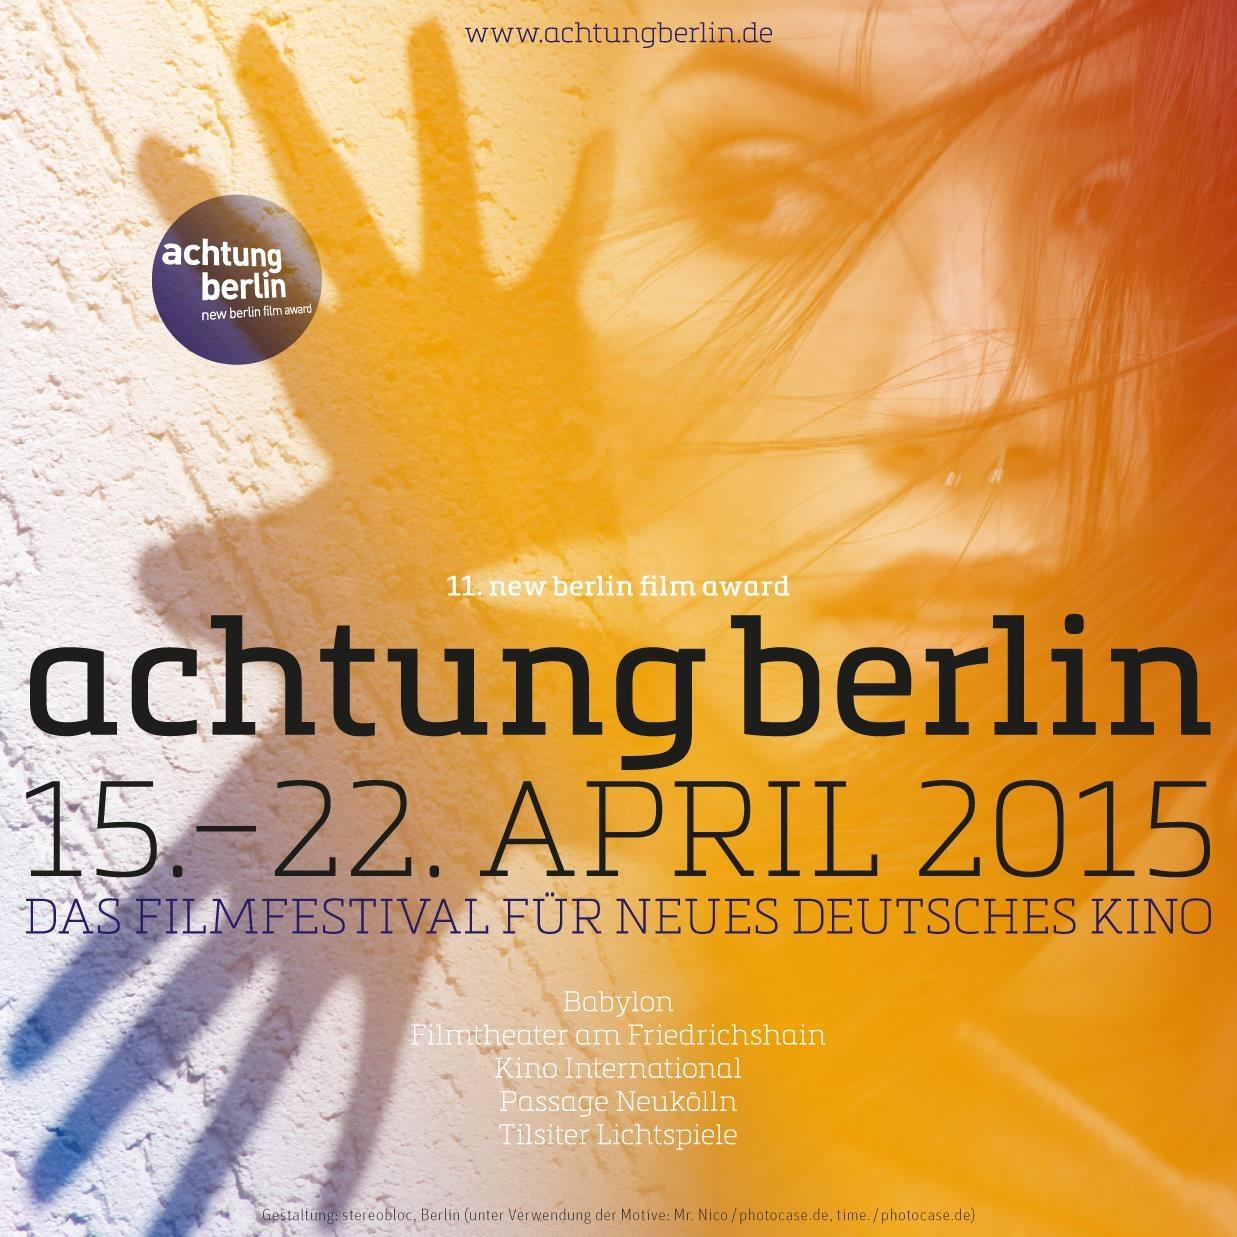 cosima kino berlin preise